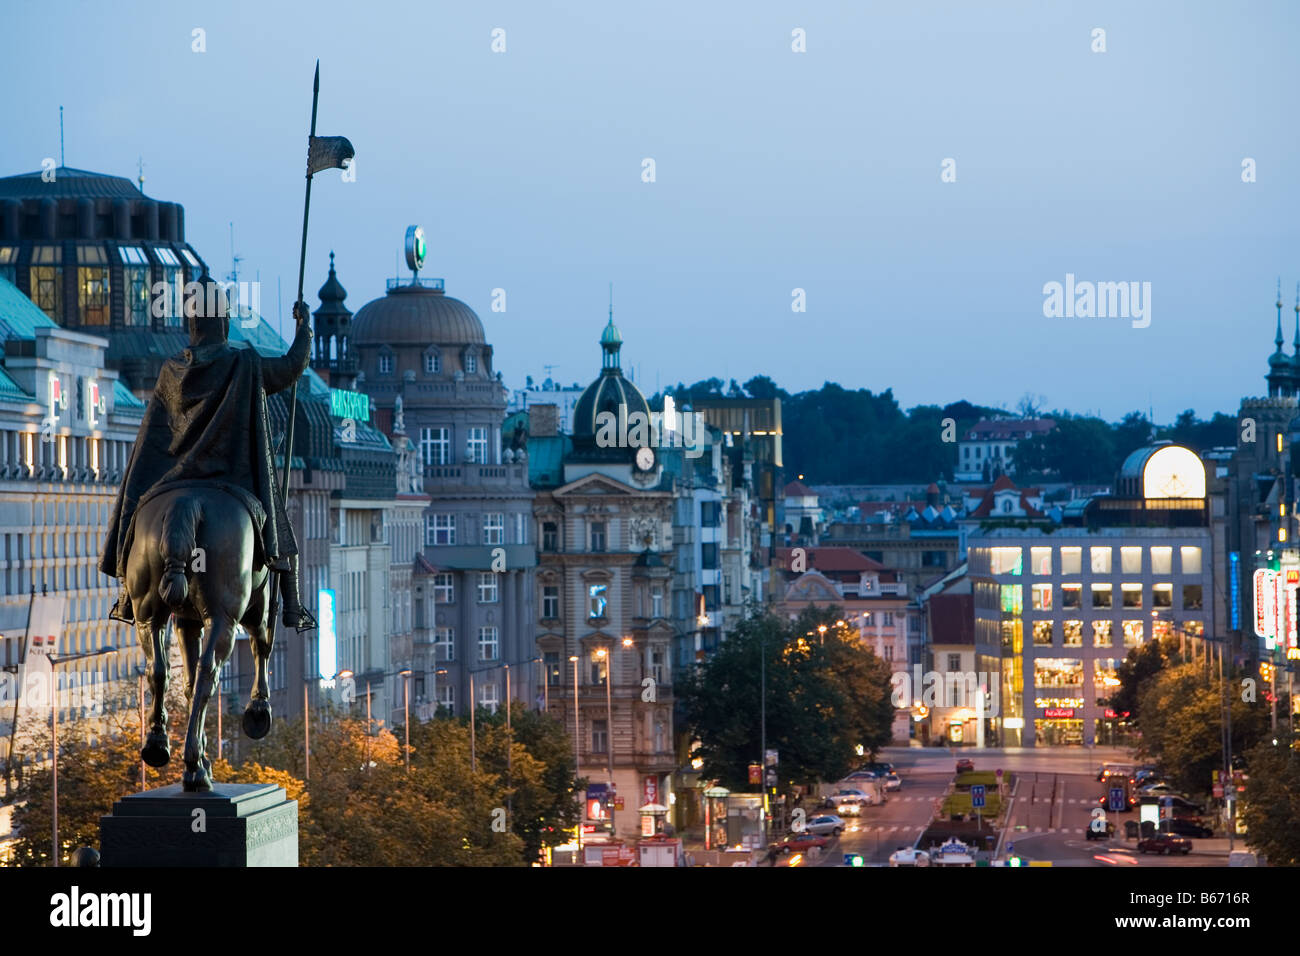 Wenceslas monument prague - Stock Image